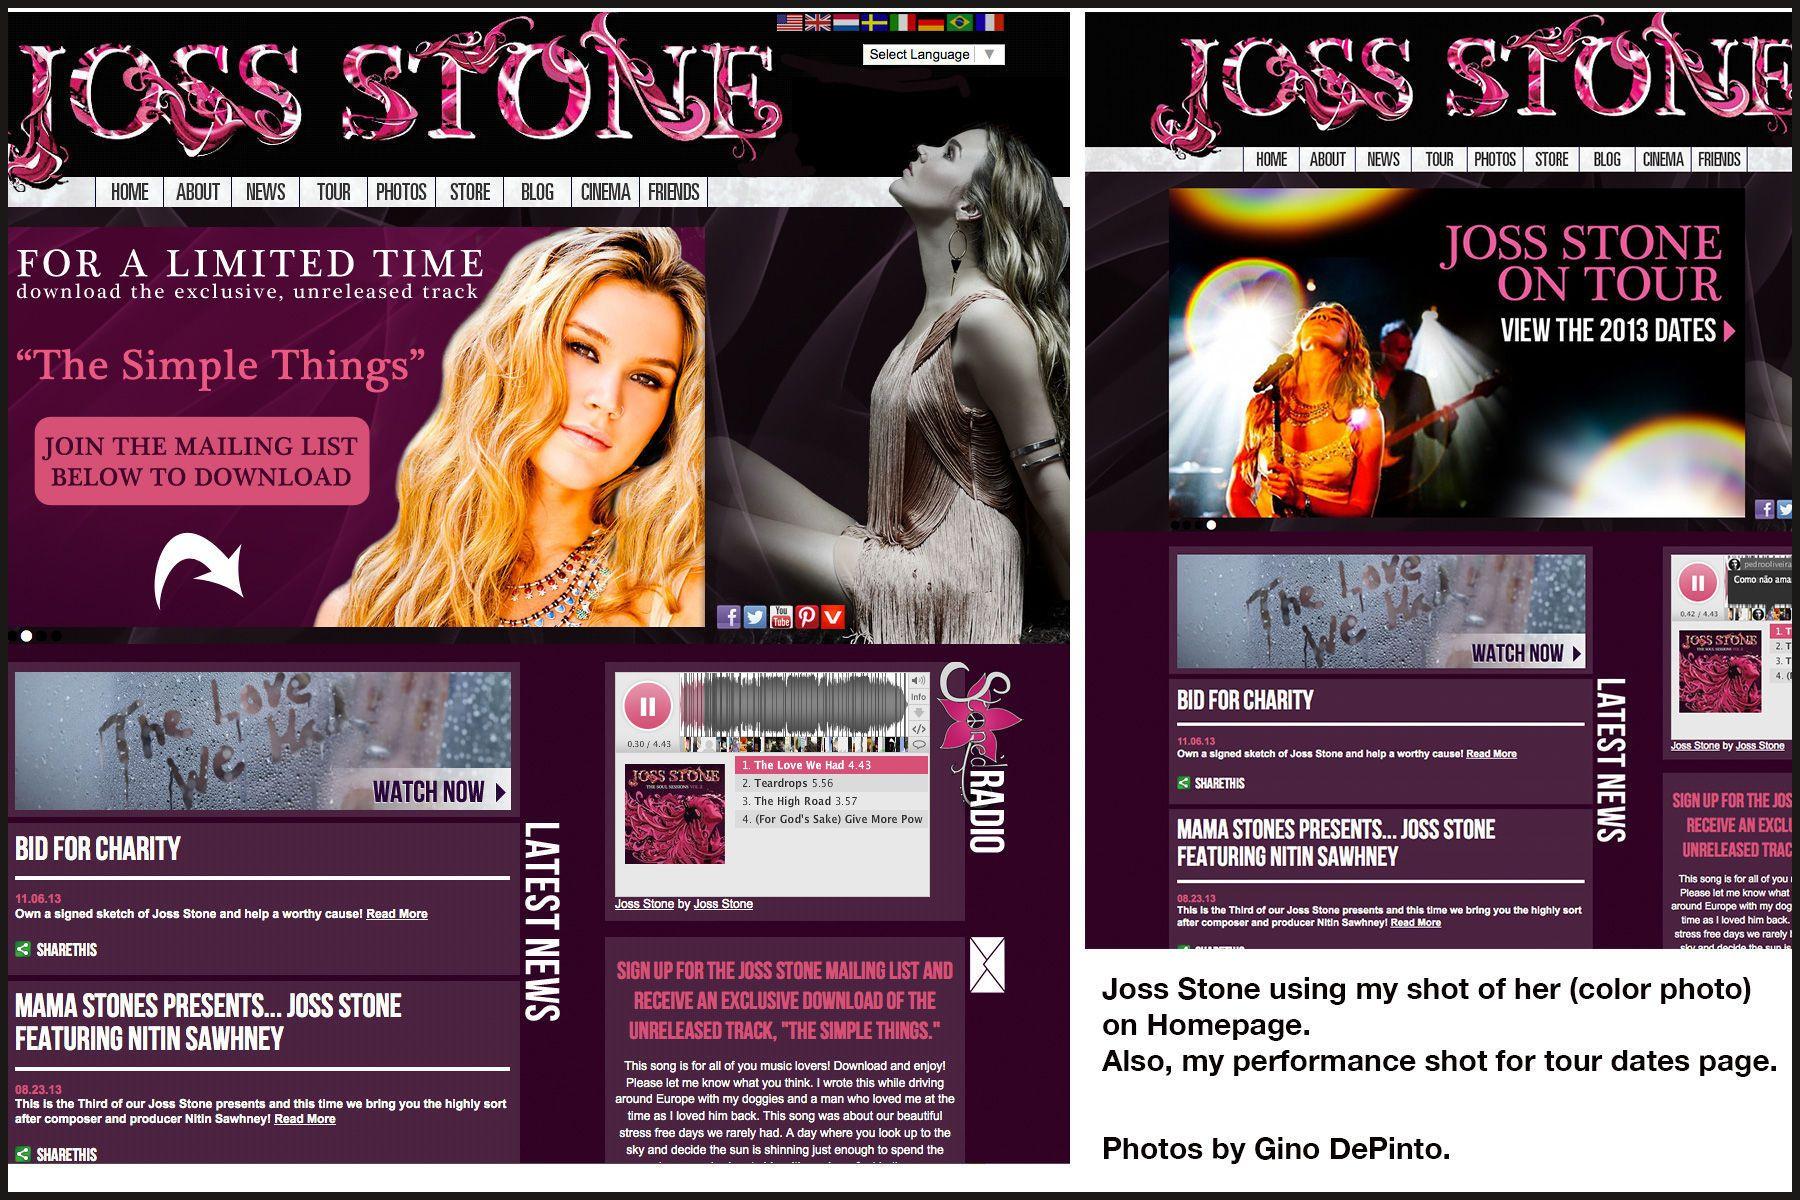 12_0_658_1r719_1joss_stone_screengrab.jpg